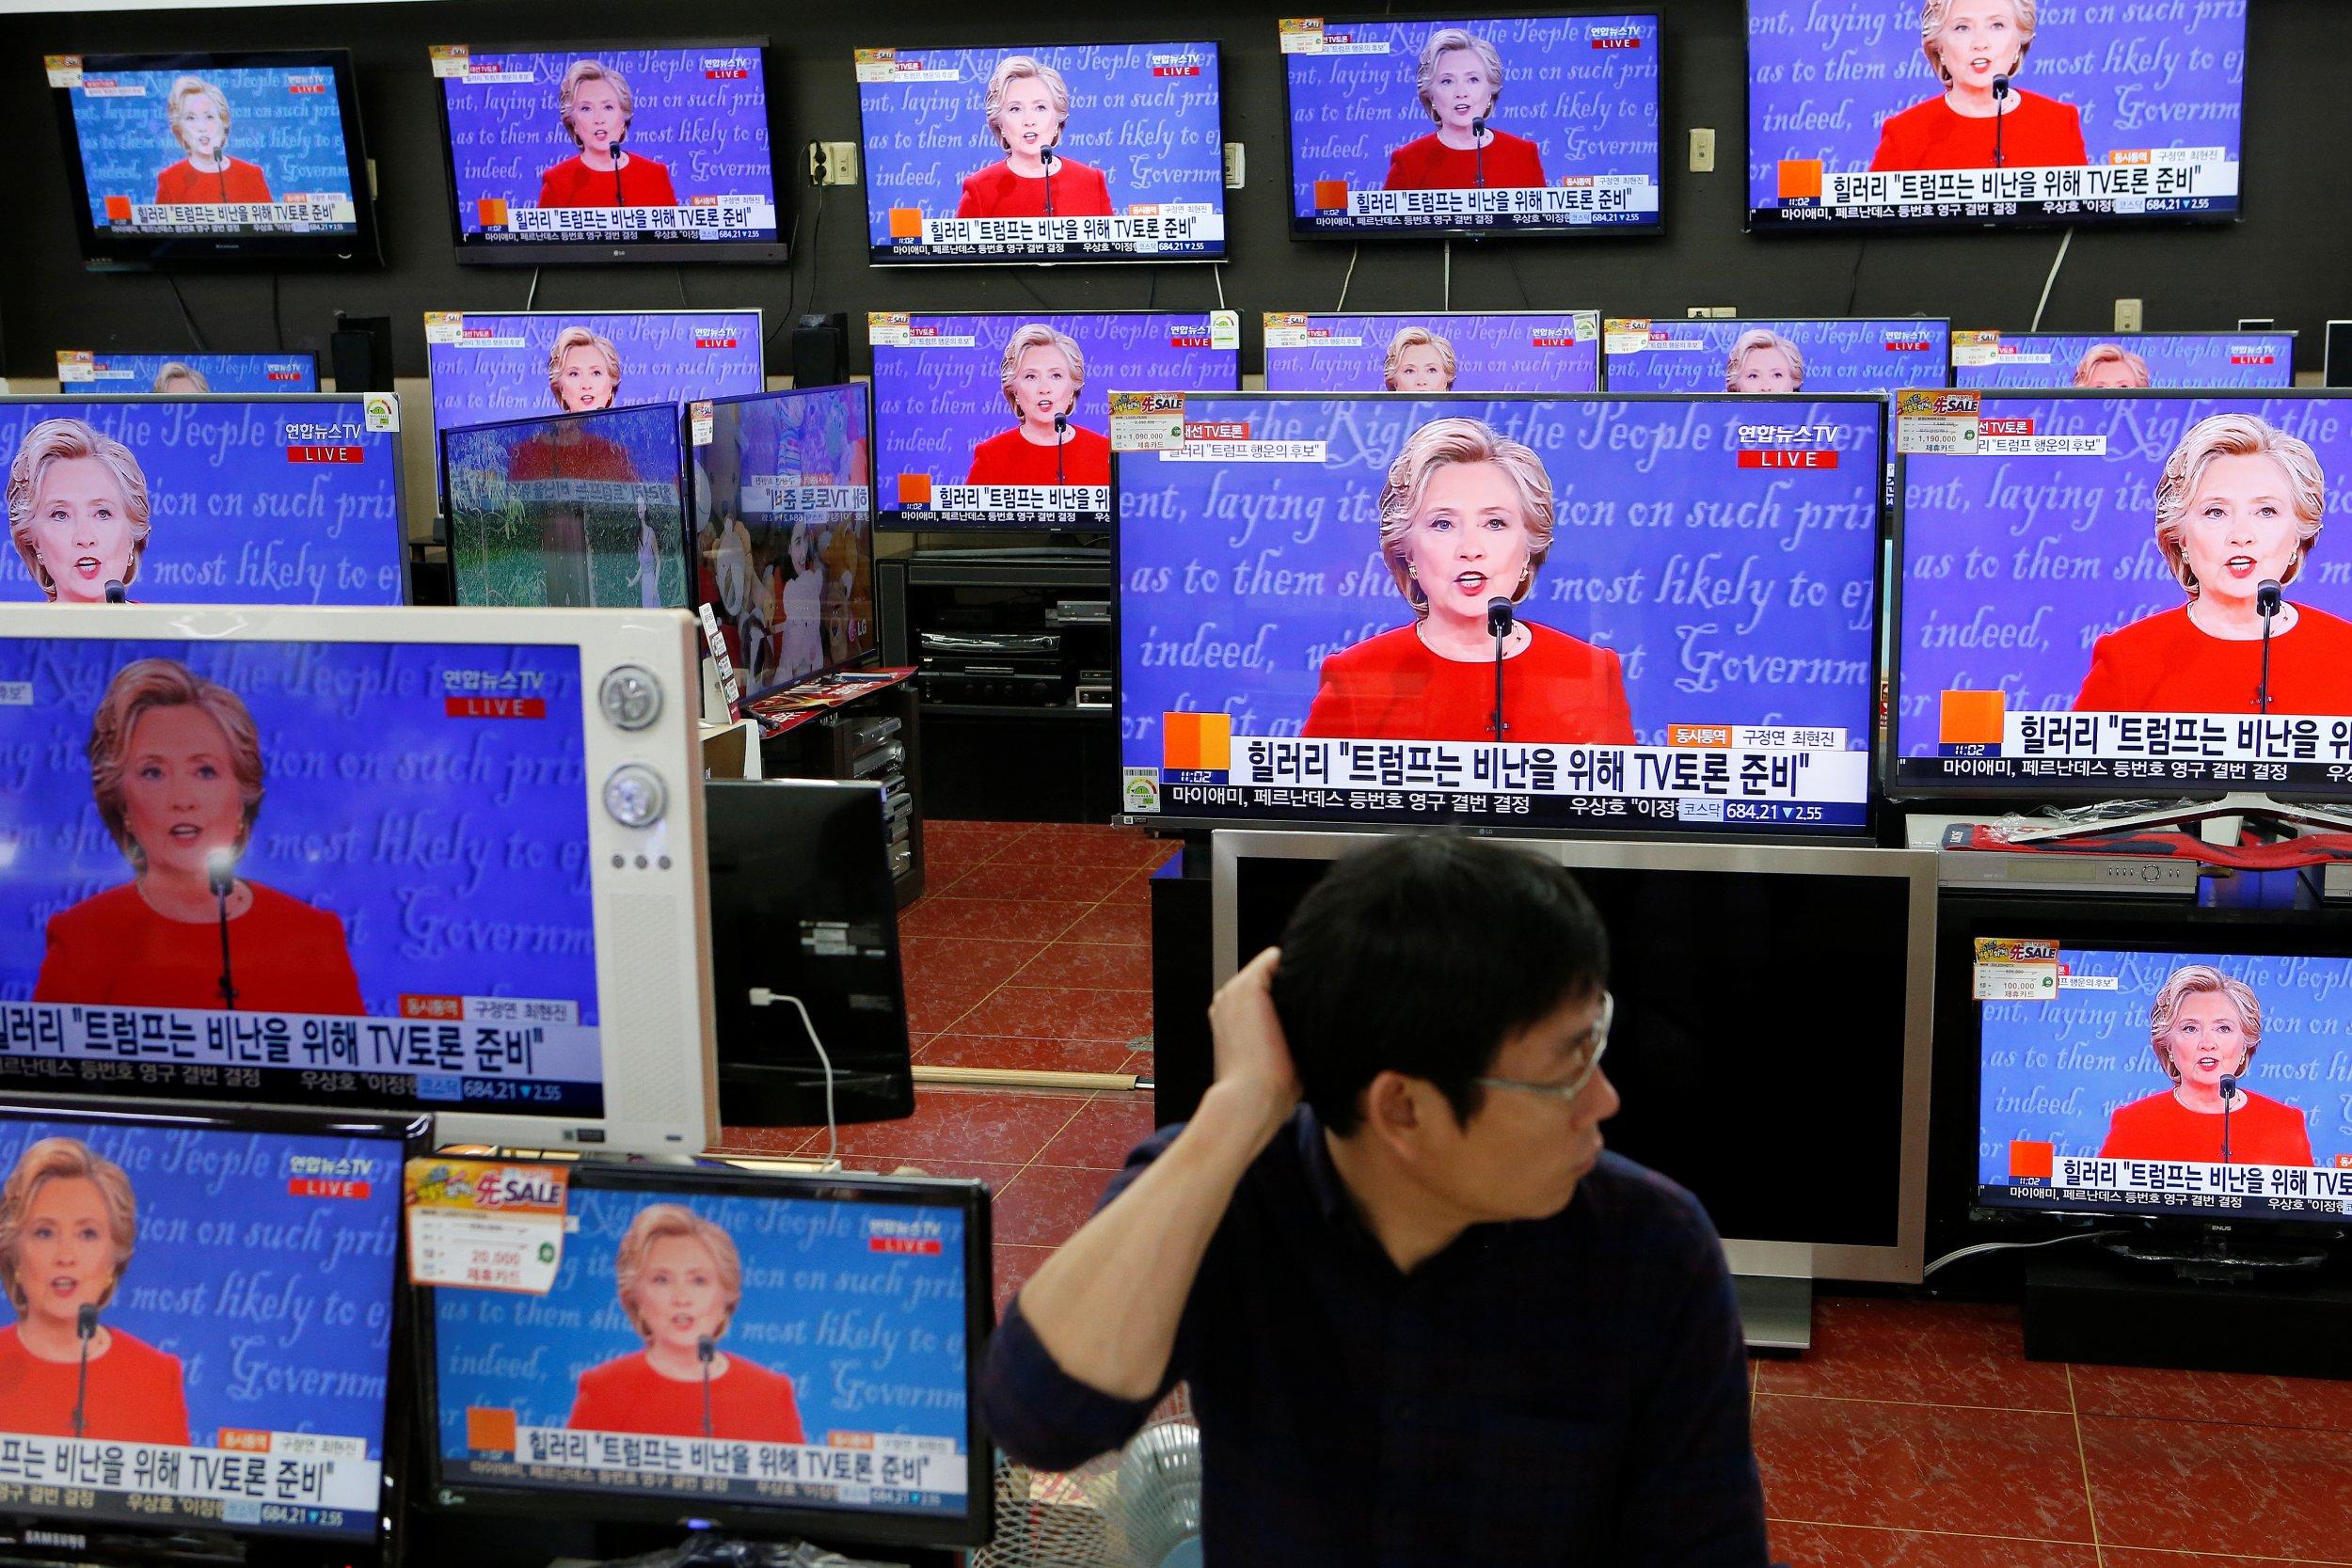 Clinton Trump debate screen